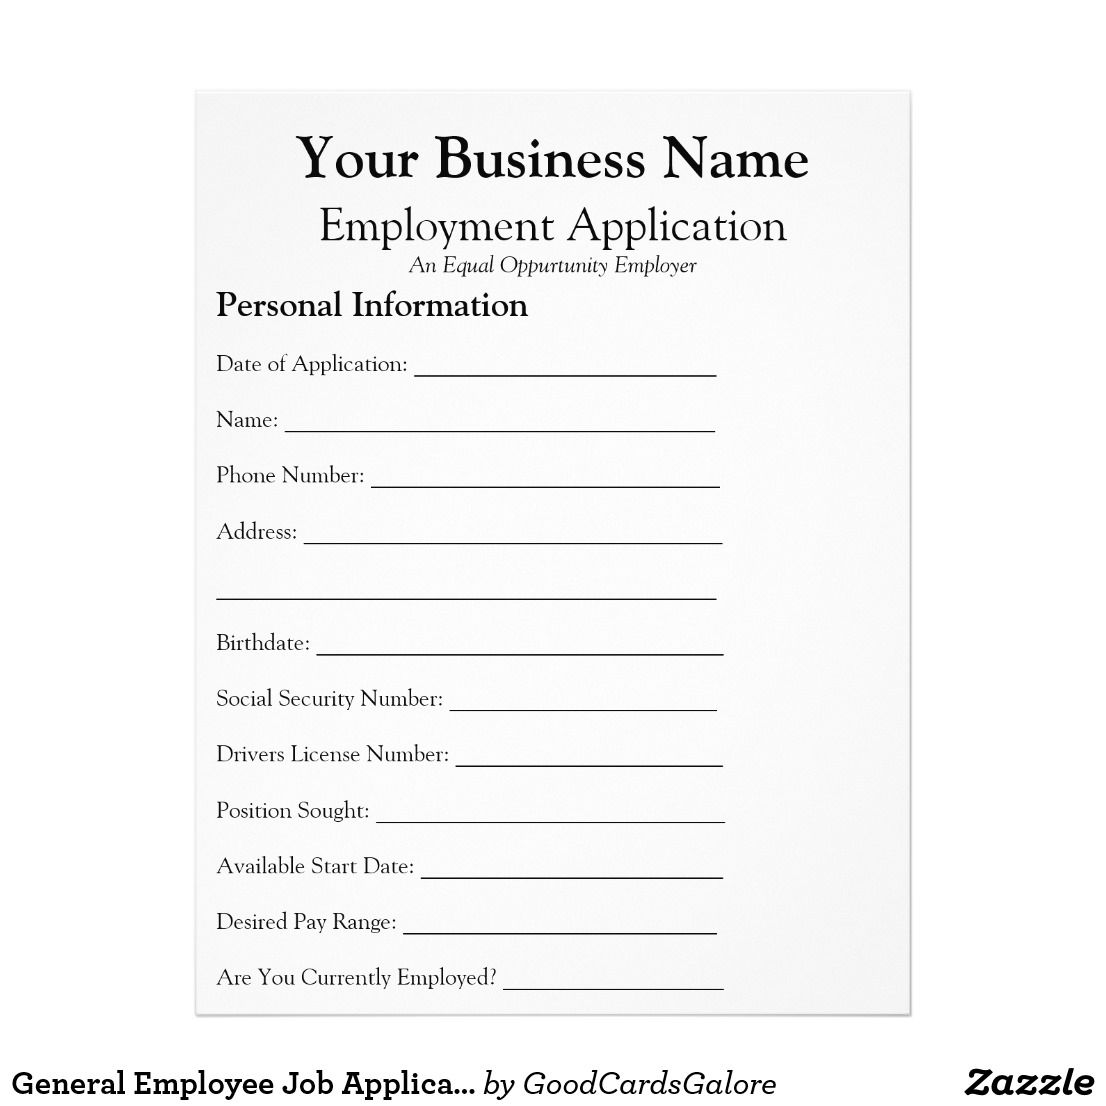 general employee job application form business flyer gift ideas